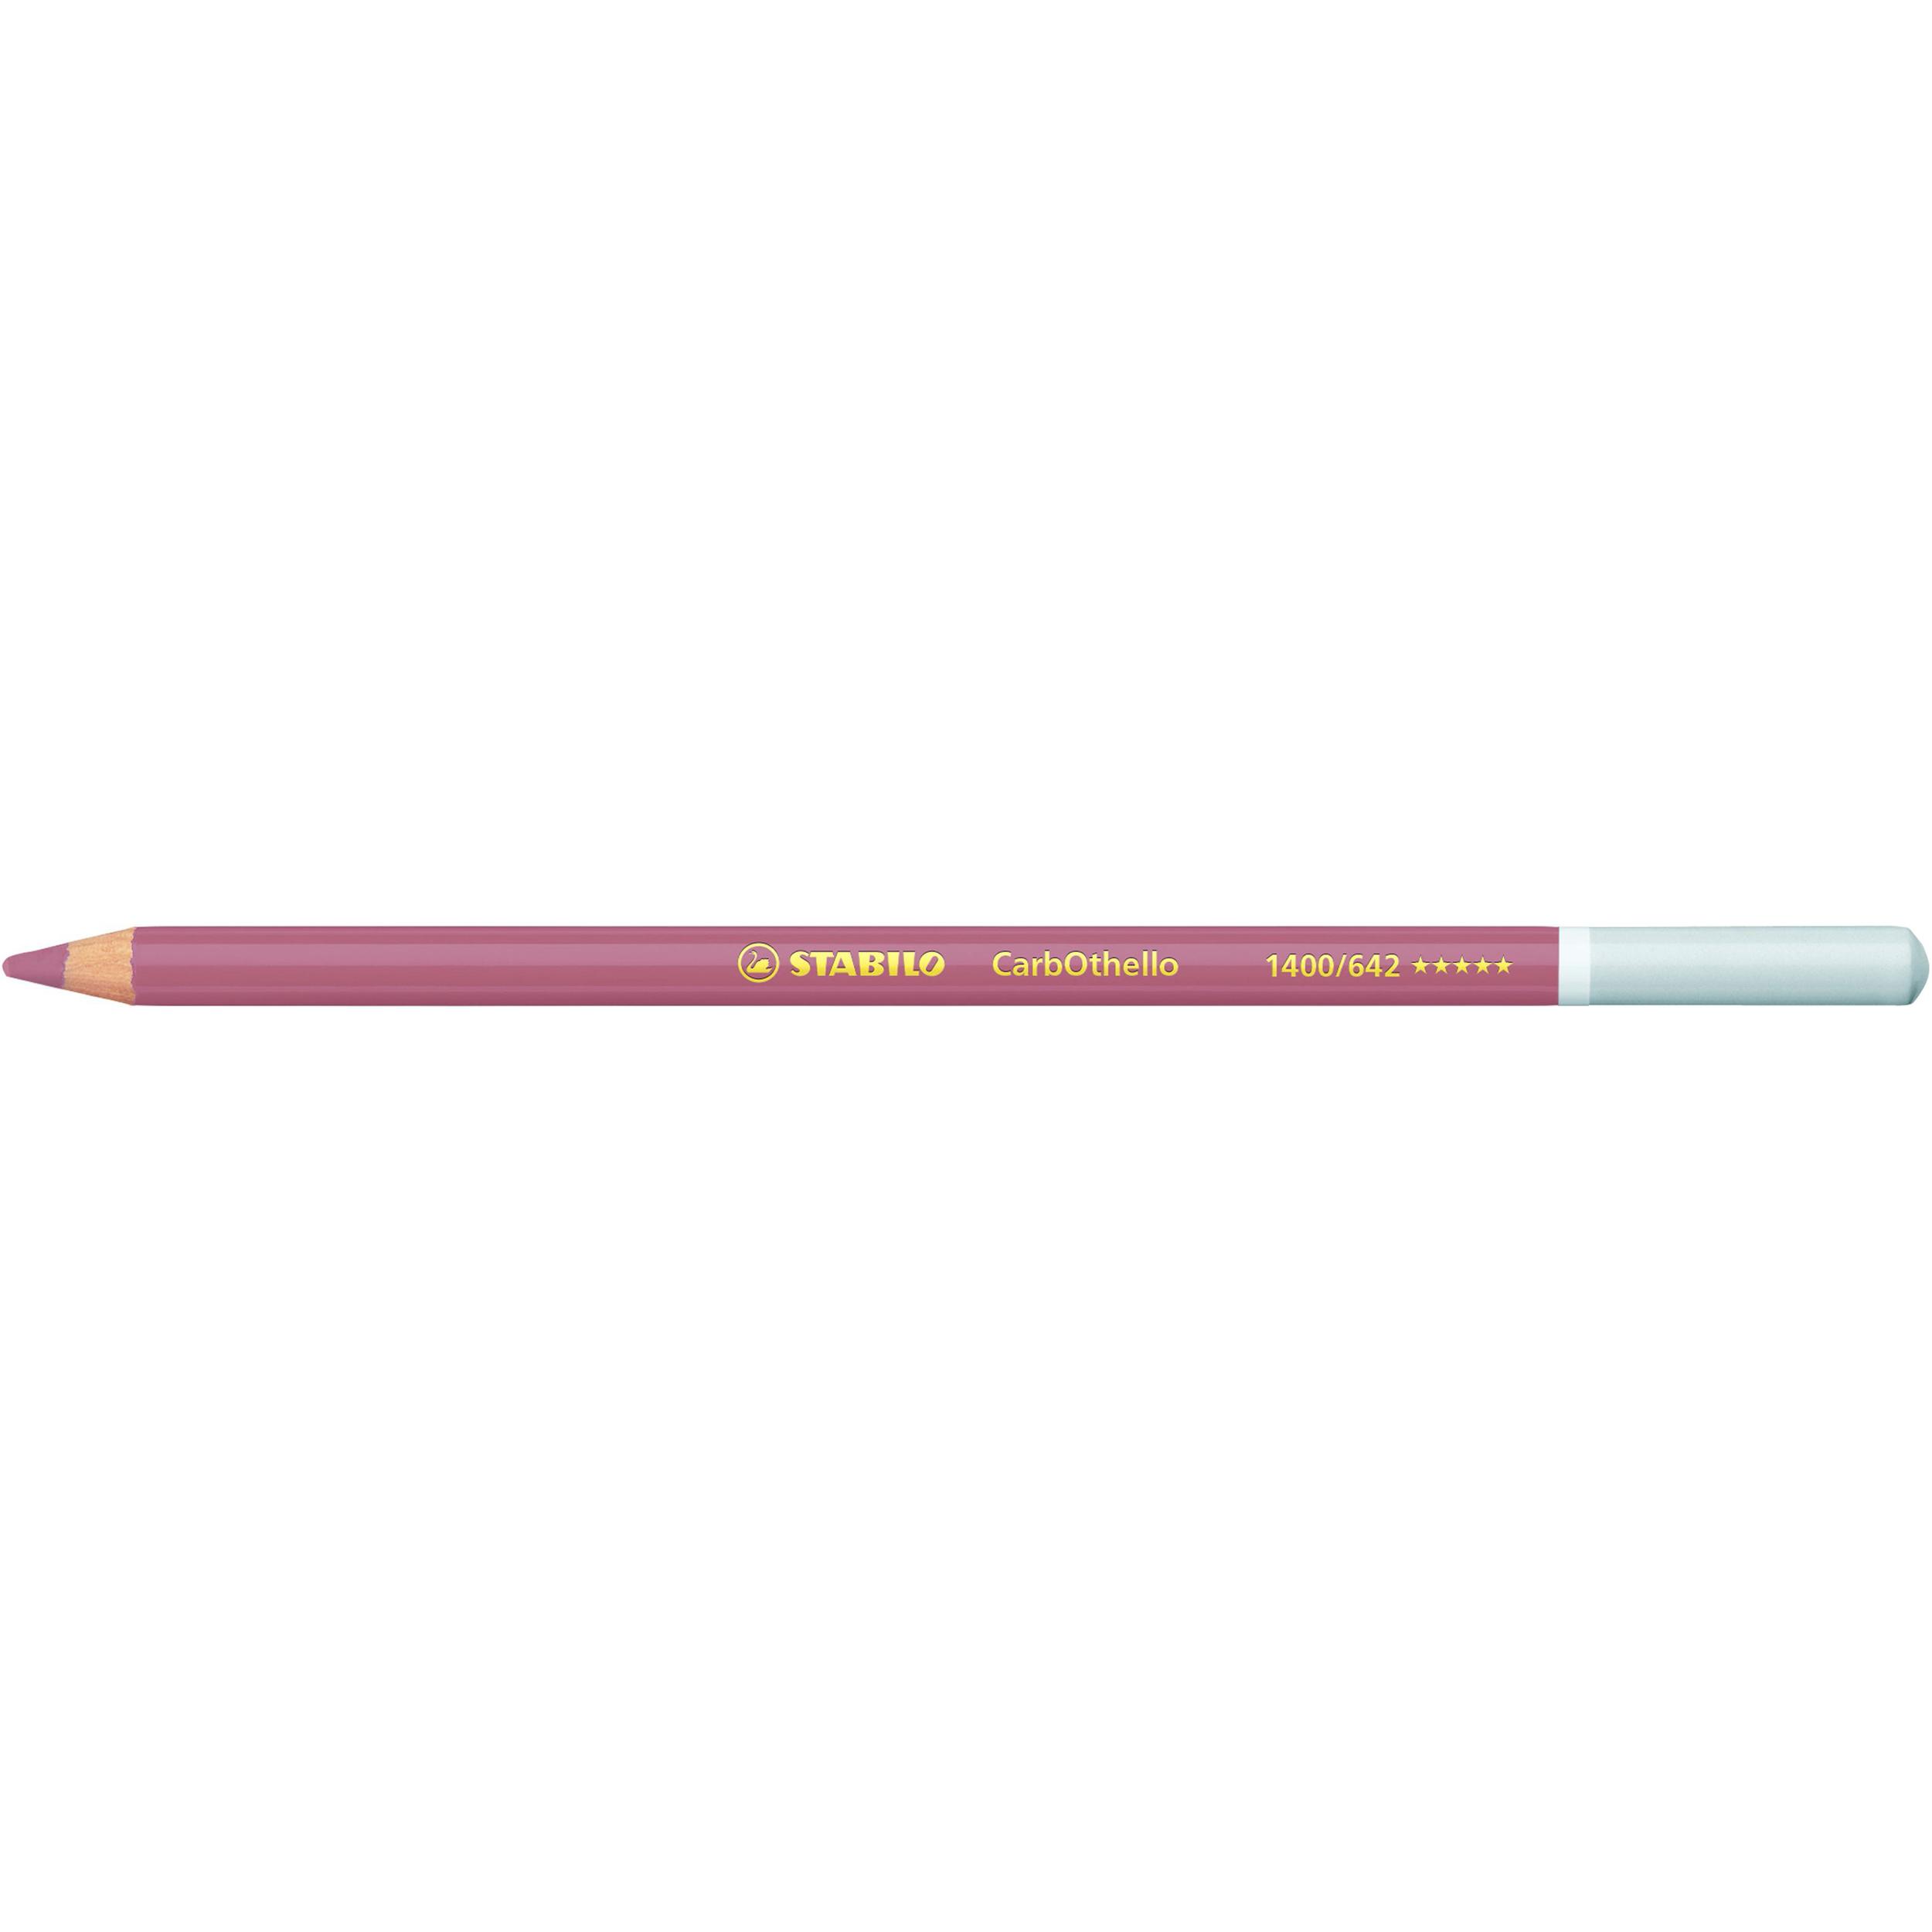 Stabilo Carbothello Pastel Pencil Caput Mortuum Violet Light 642